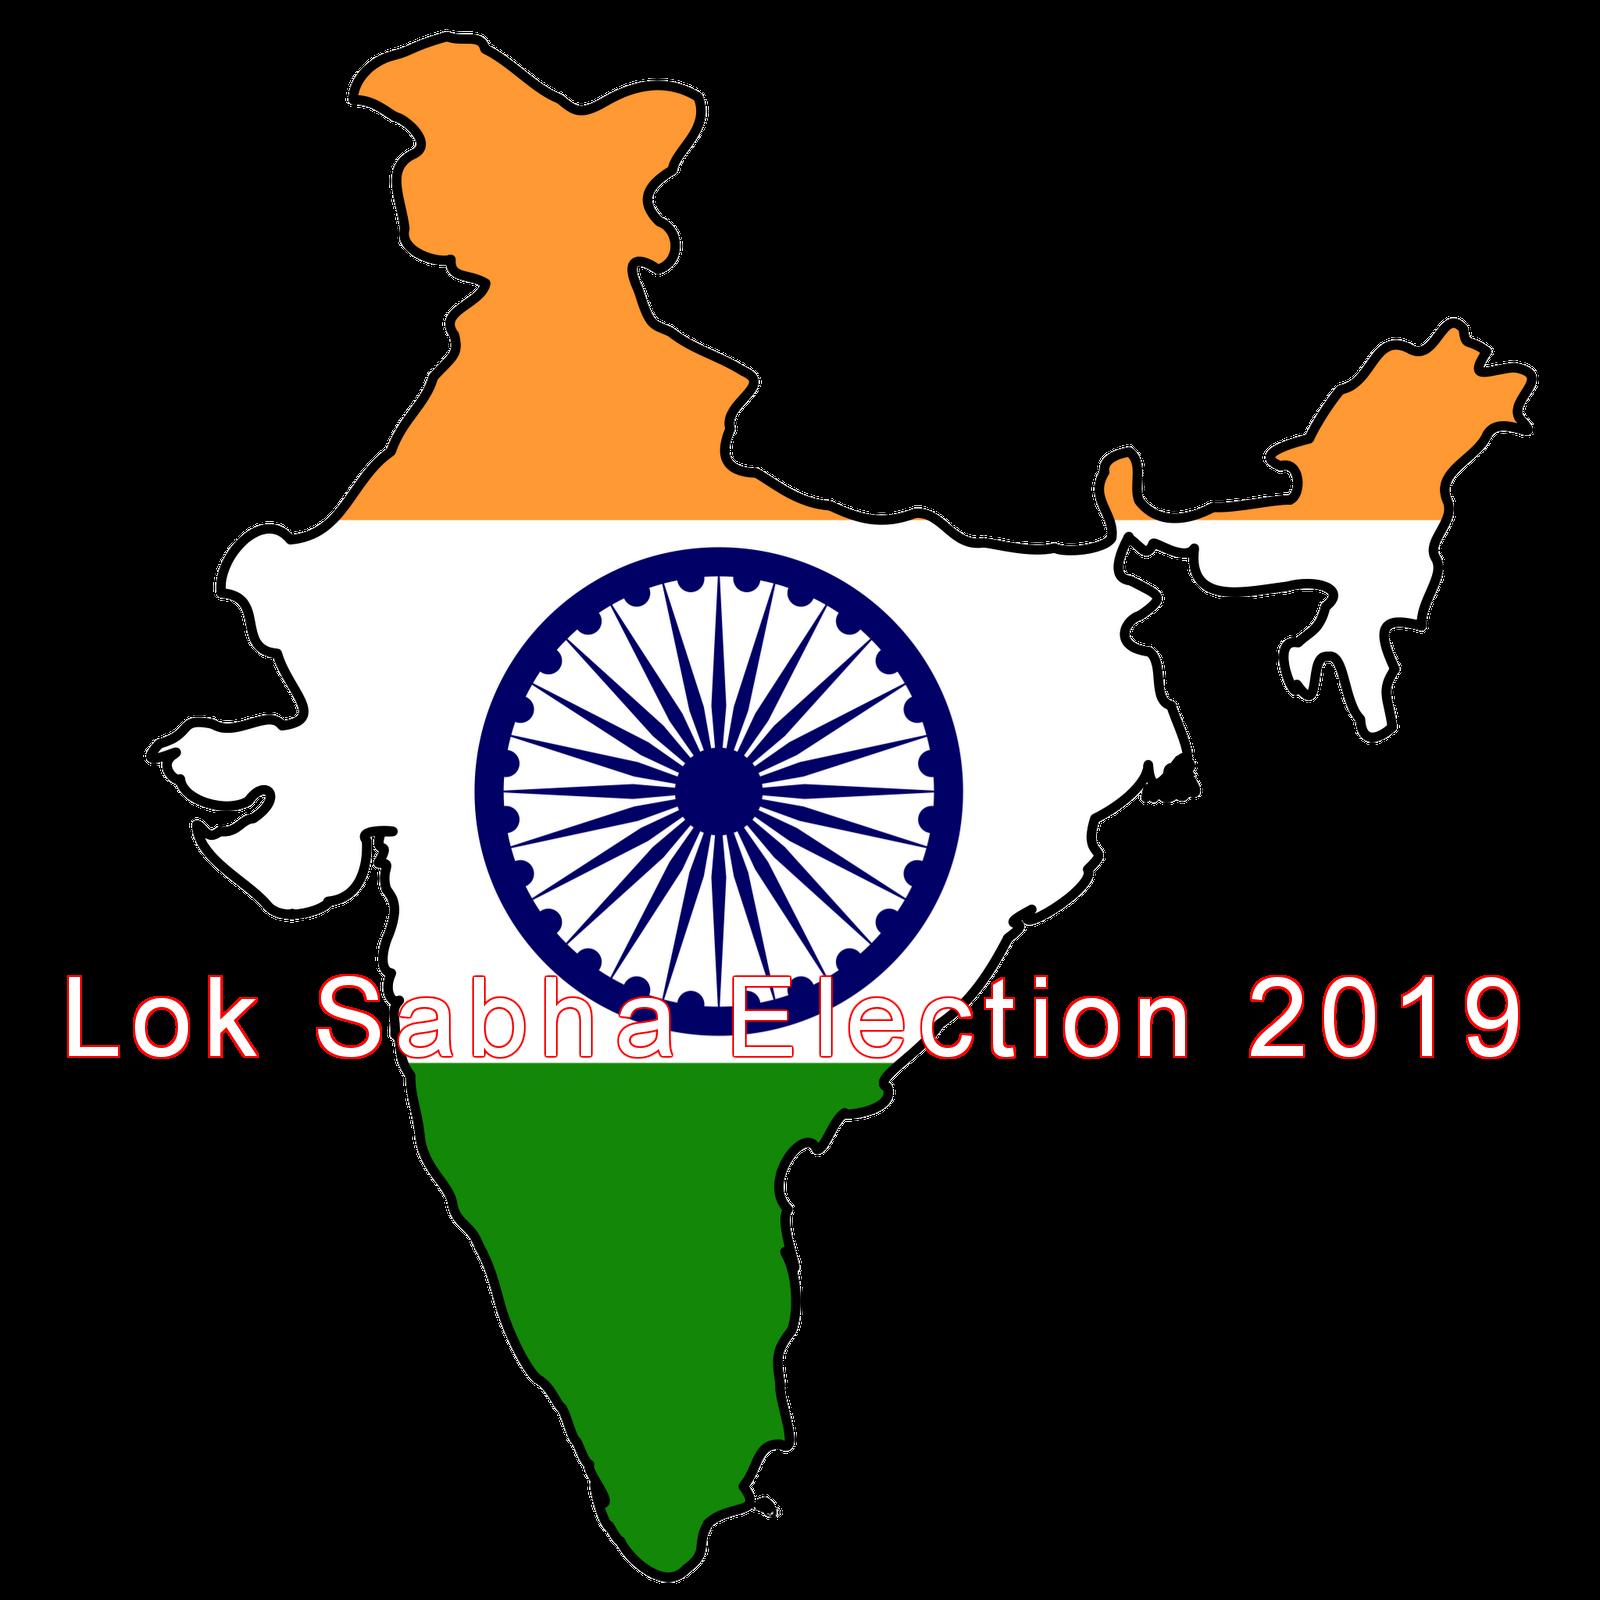 Politician clipart election india. Lok sabha elections details